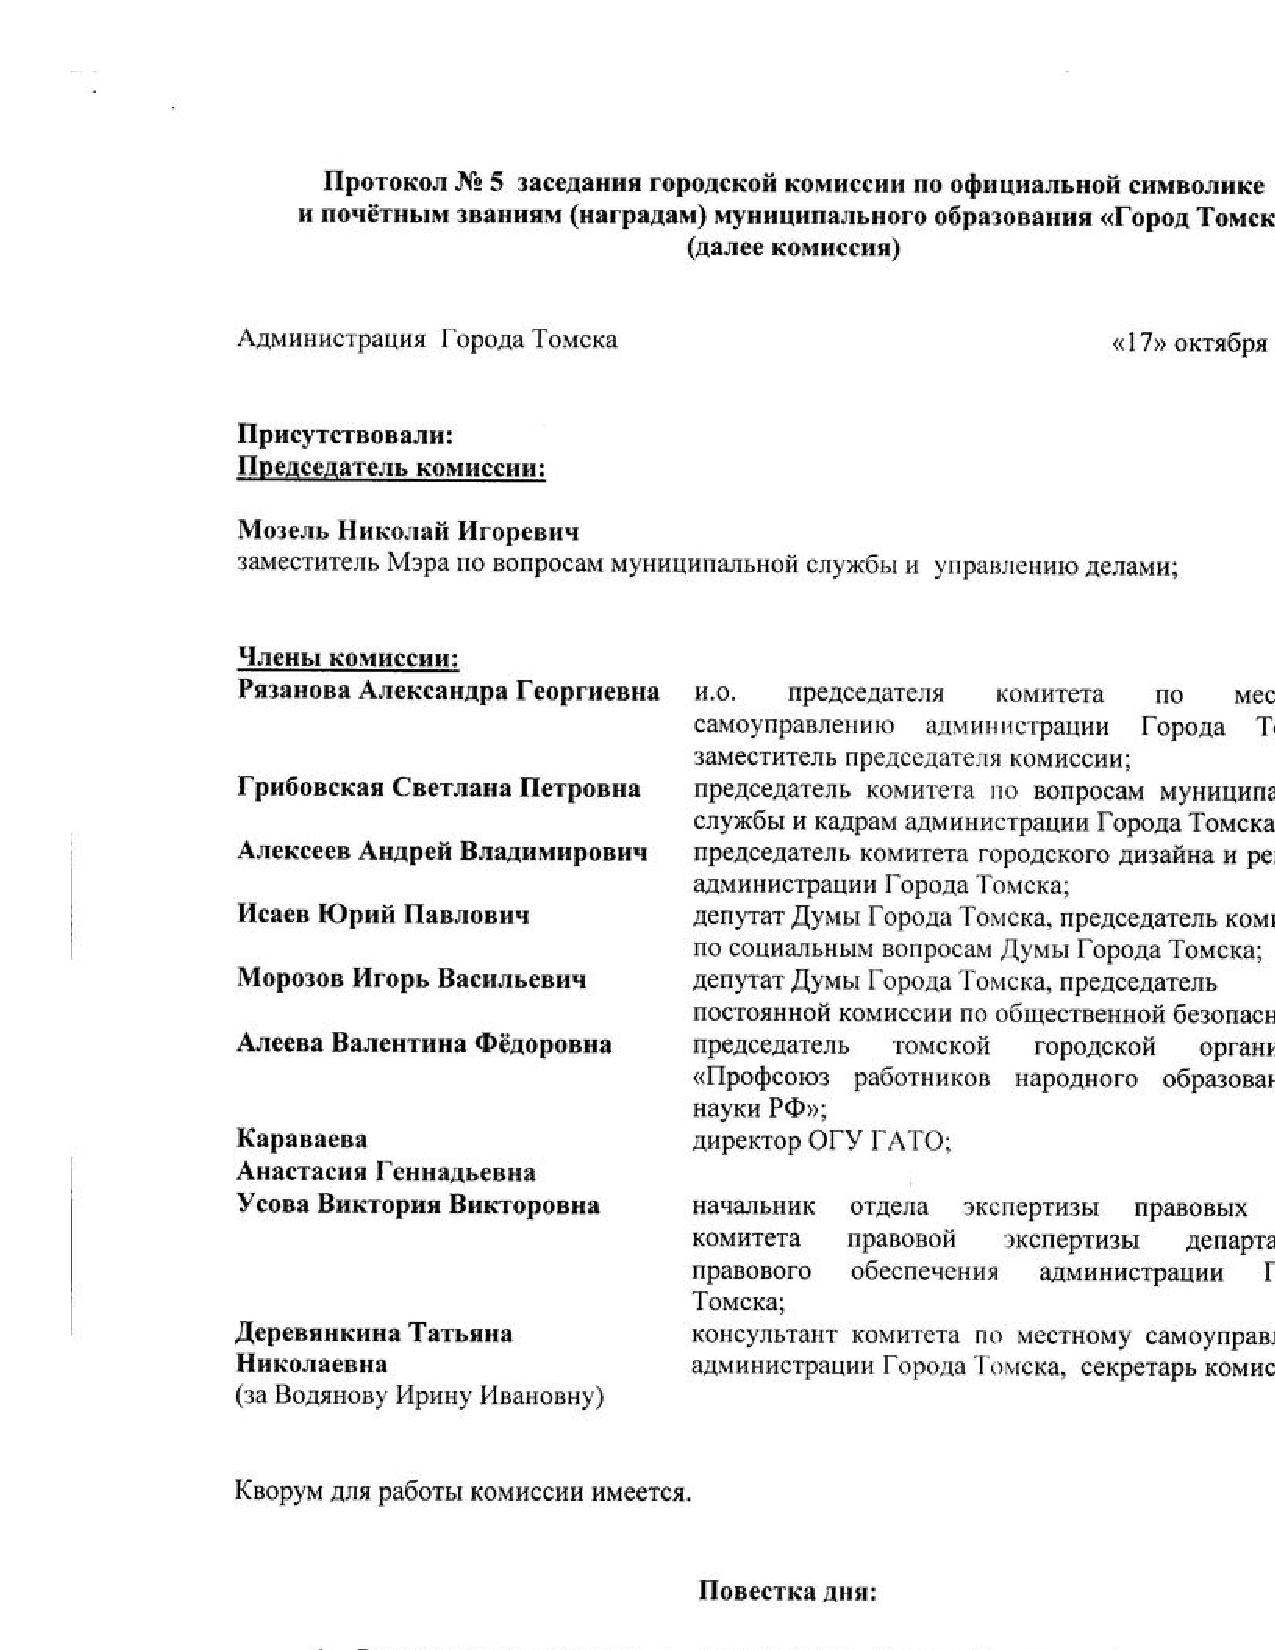 Трушин Юрий Владимирович - Персона РФ   1650x1275